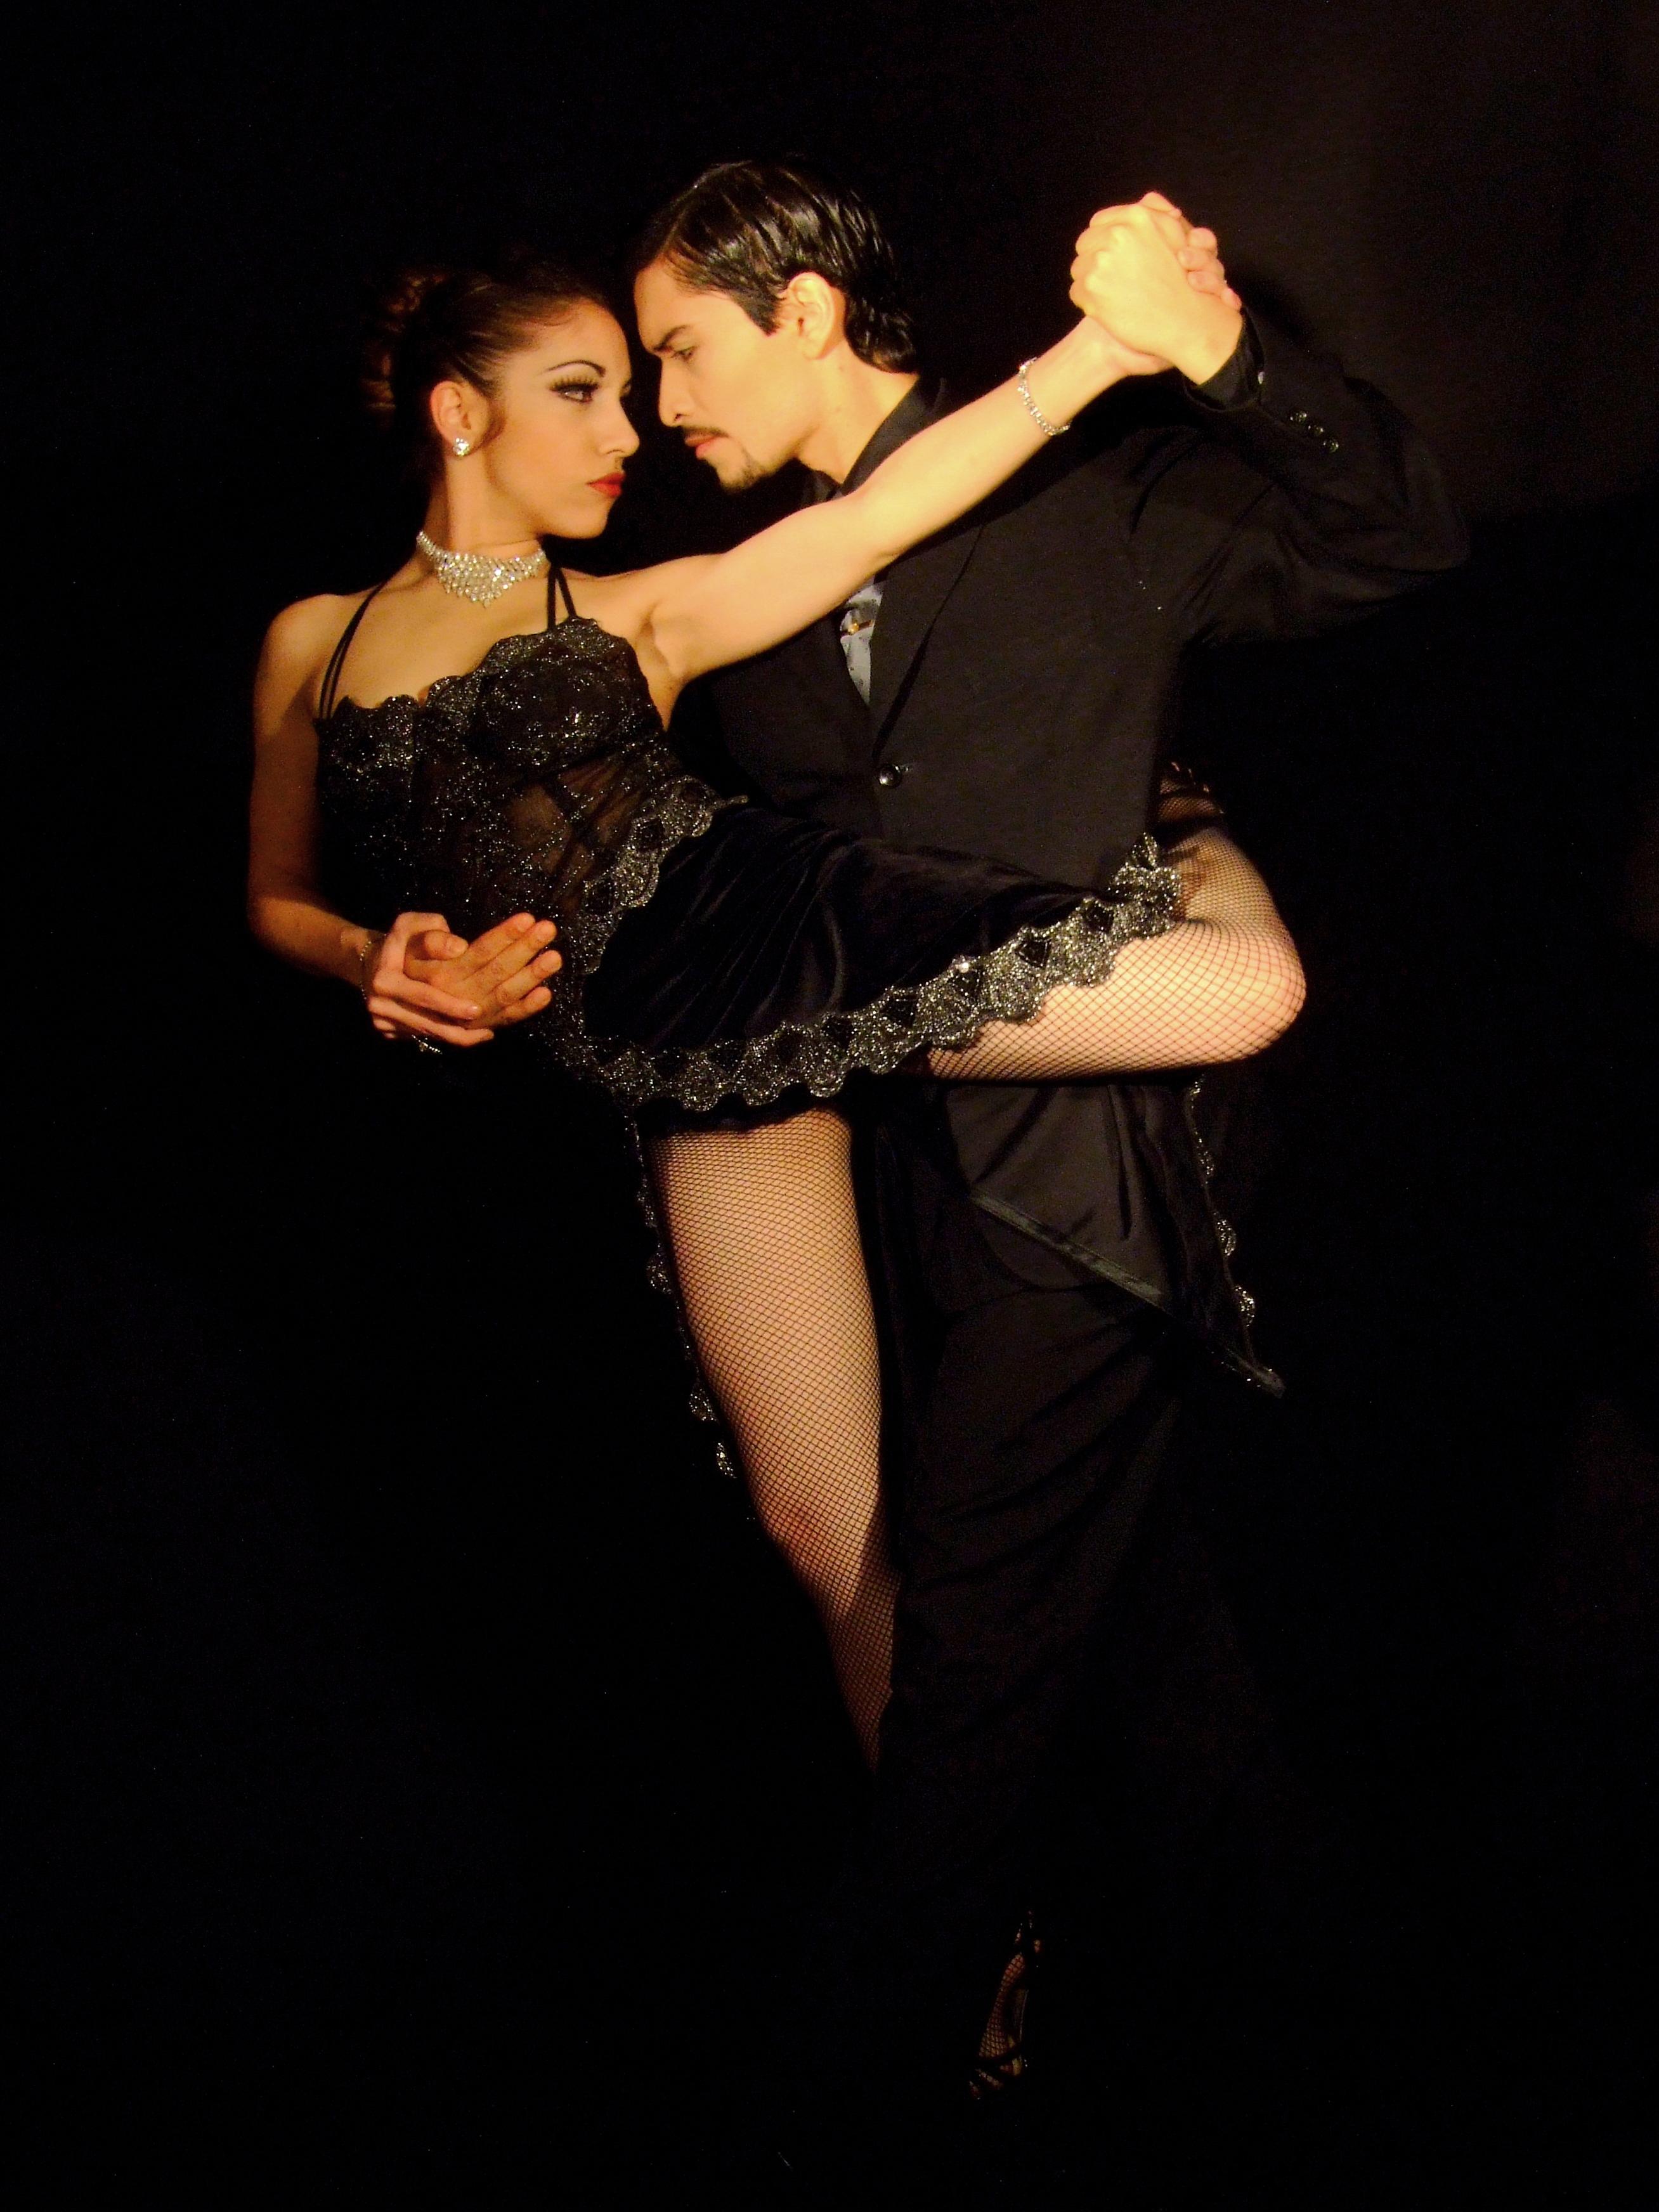 File:Tango dance 02 jpg - Wikimedia Commons